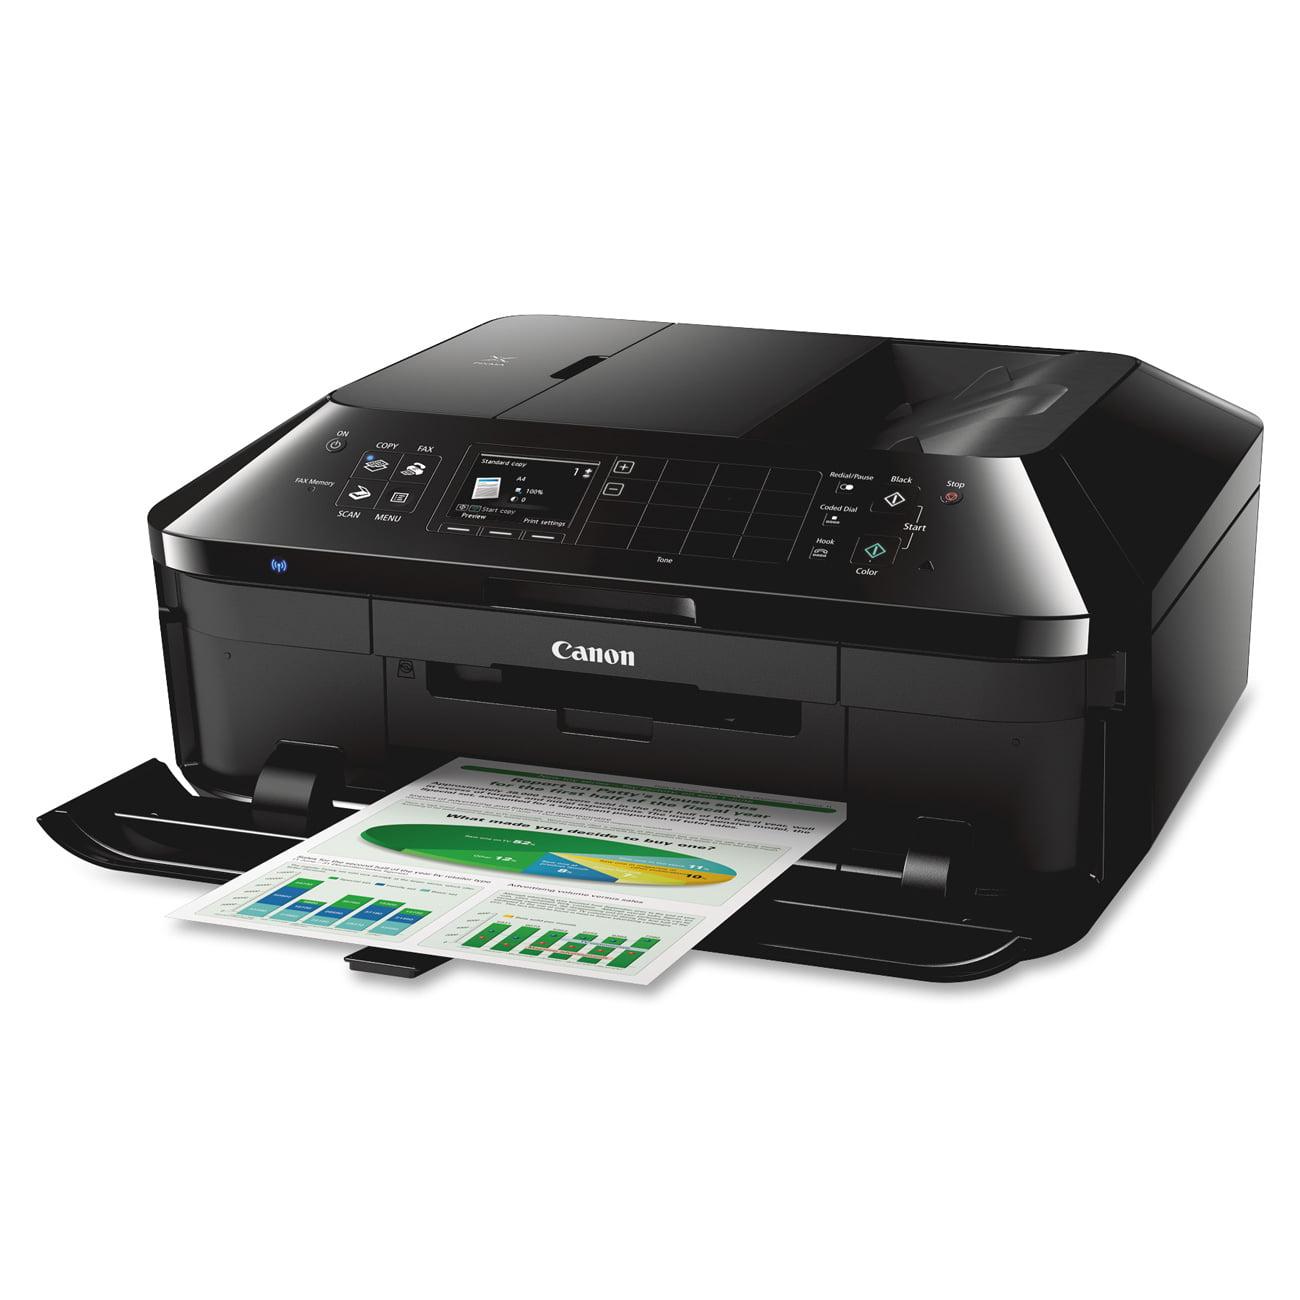 Canon PIXMA MX922 Wireless All-In-One Office Inkjet Printer,  Copy/Fax/Print/Scan - Walmart.com